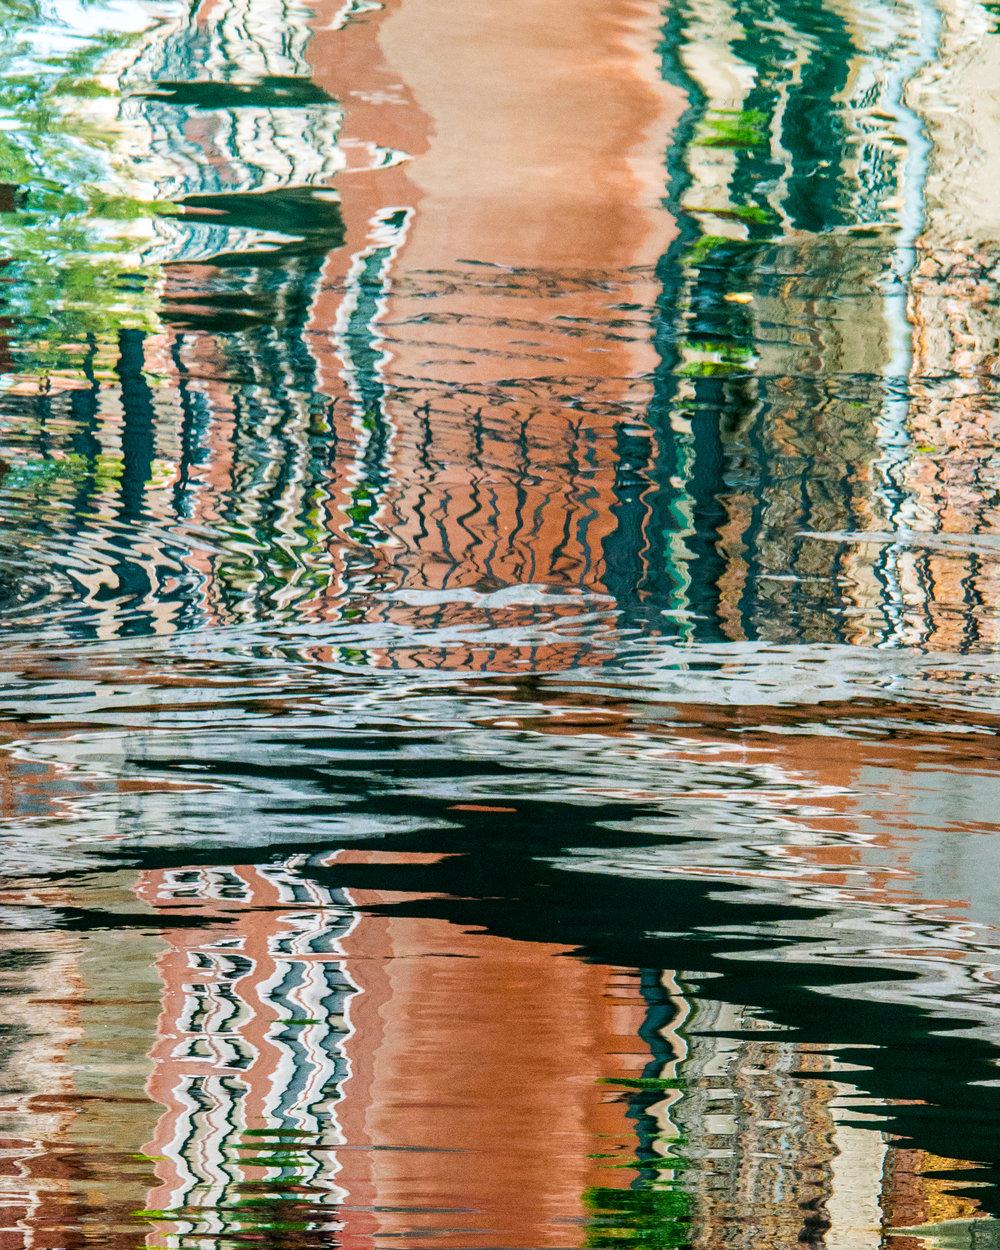 08-Reflections-5.jpg